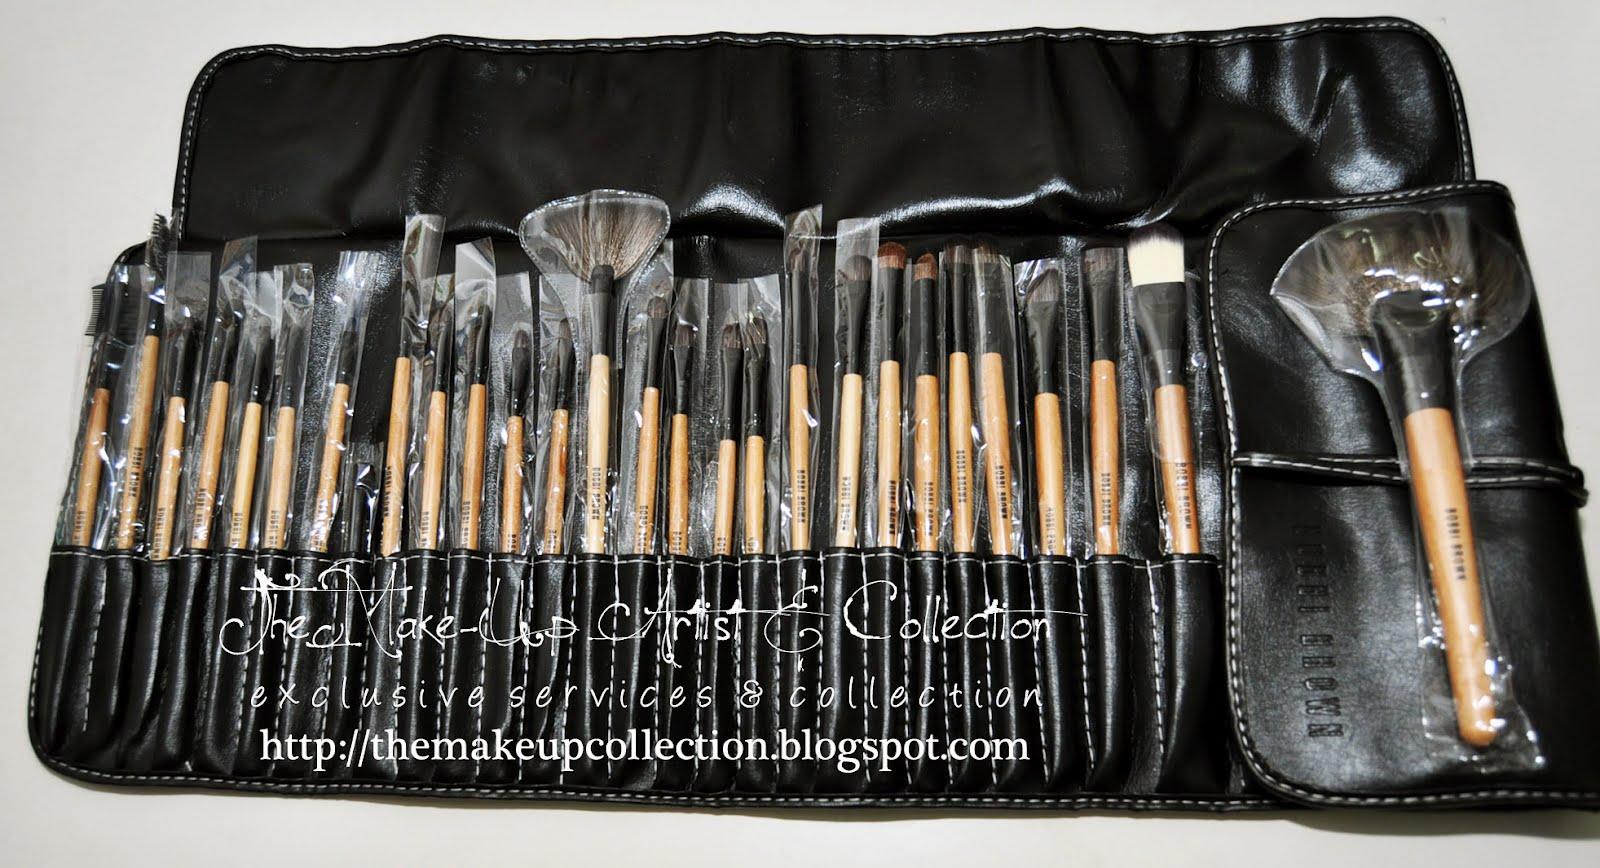 The Make Up Artist Amp Collection Brush Bobbi Brown 32